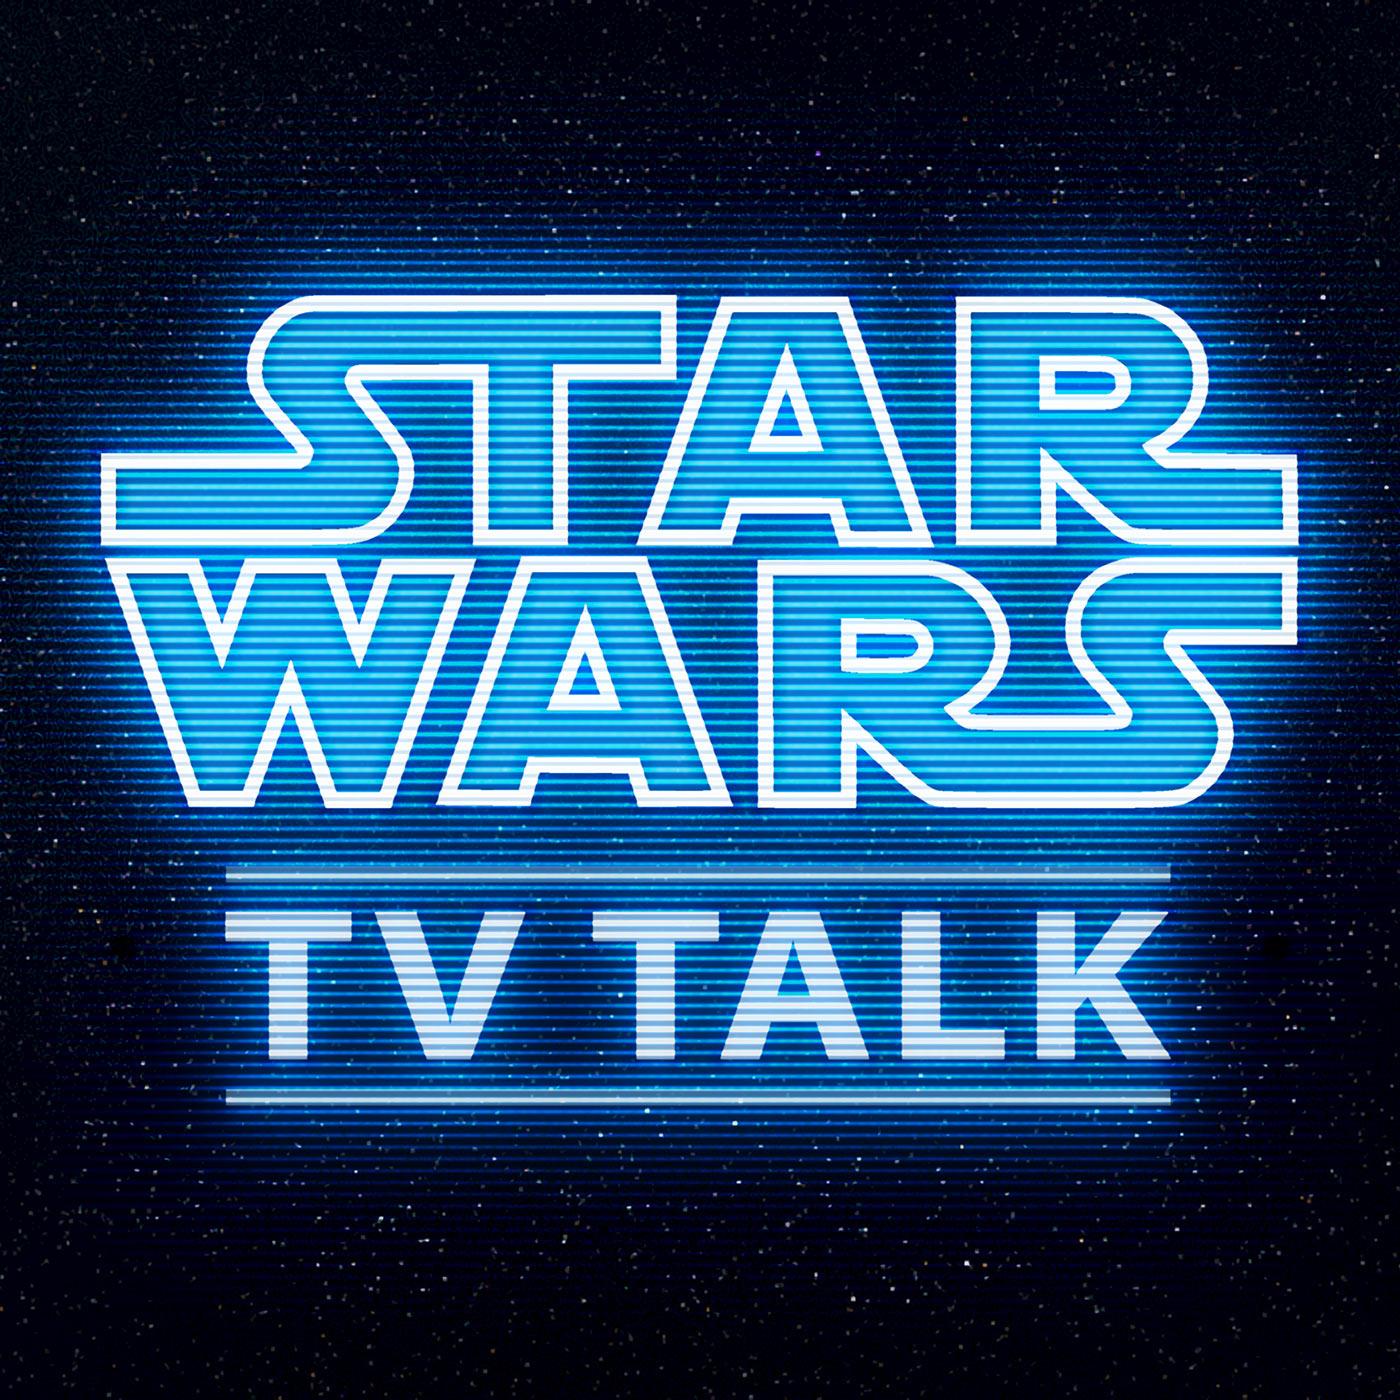 Show artwork for Star Wars TV Talk